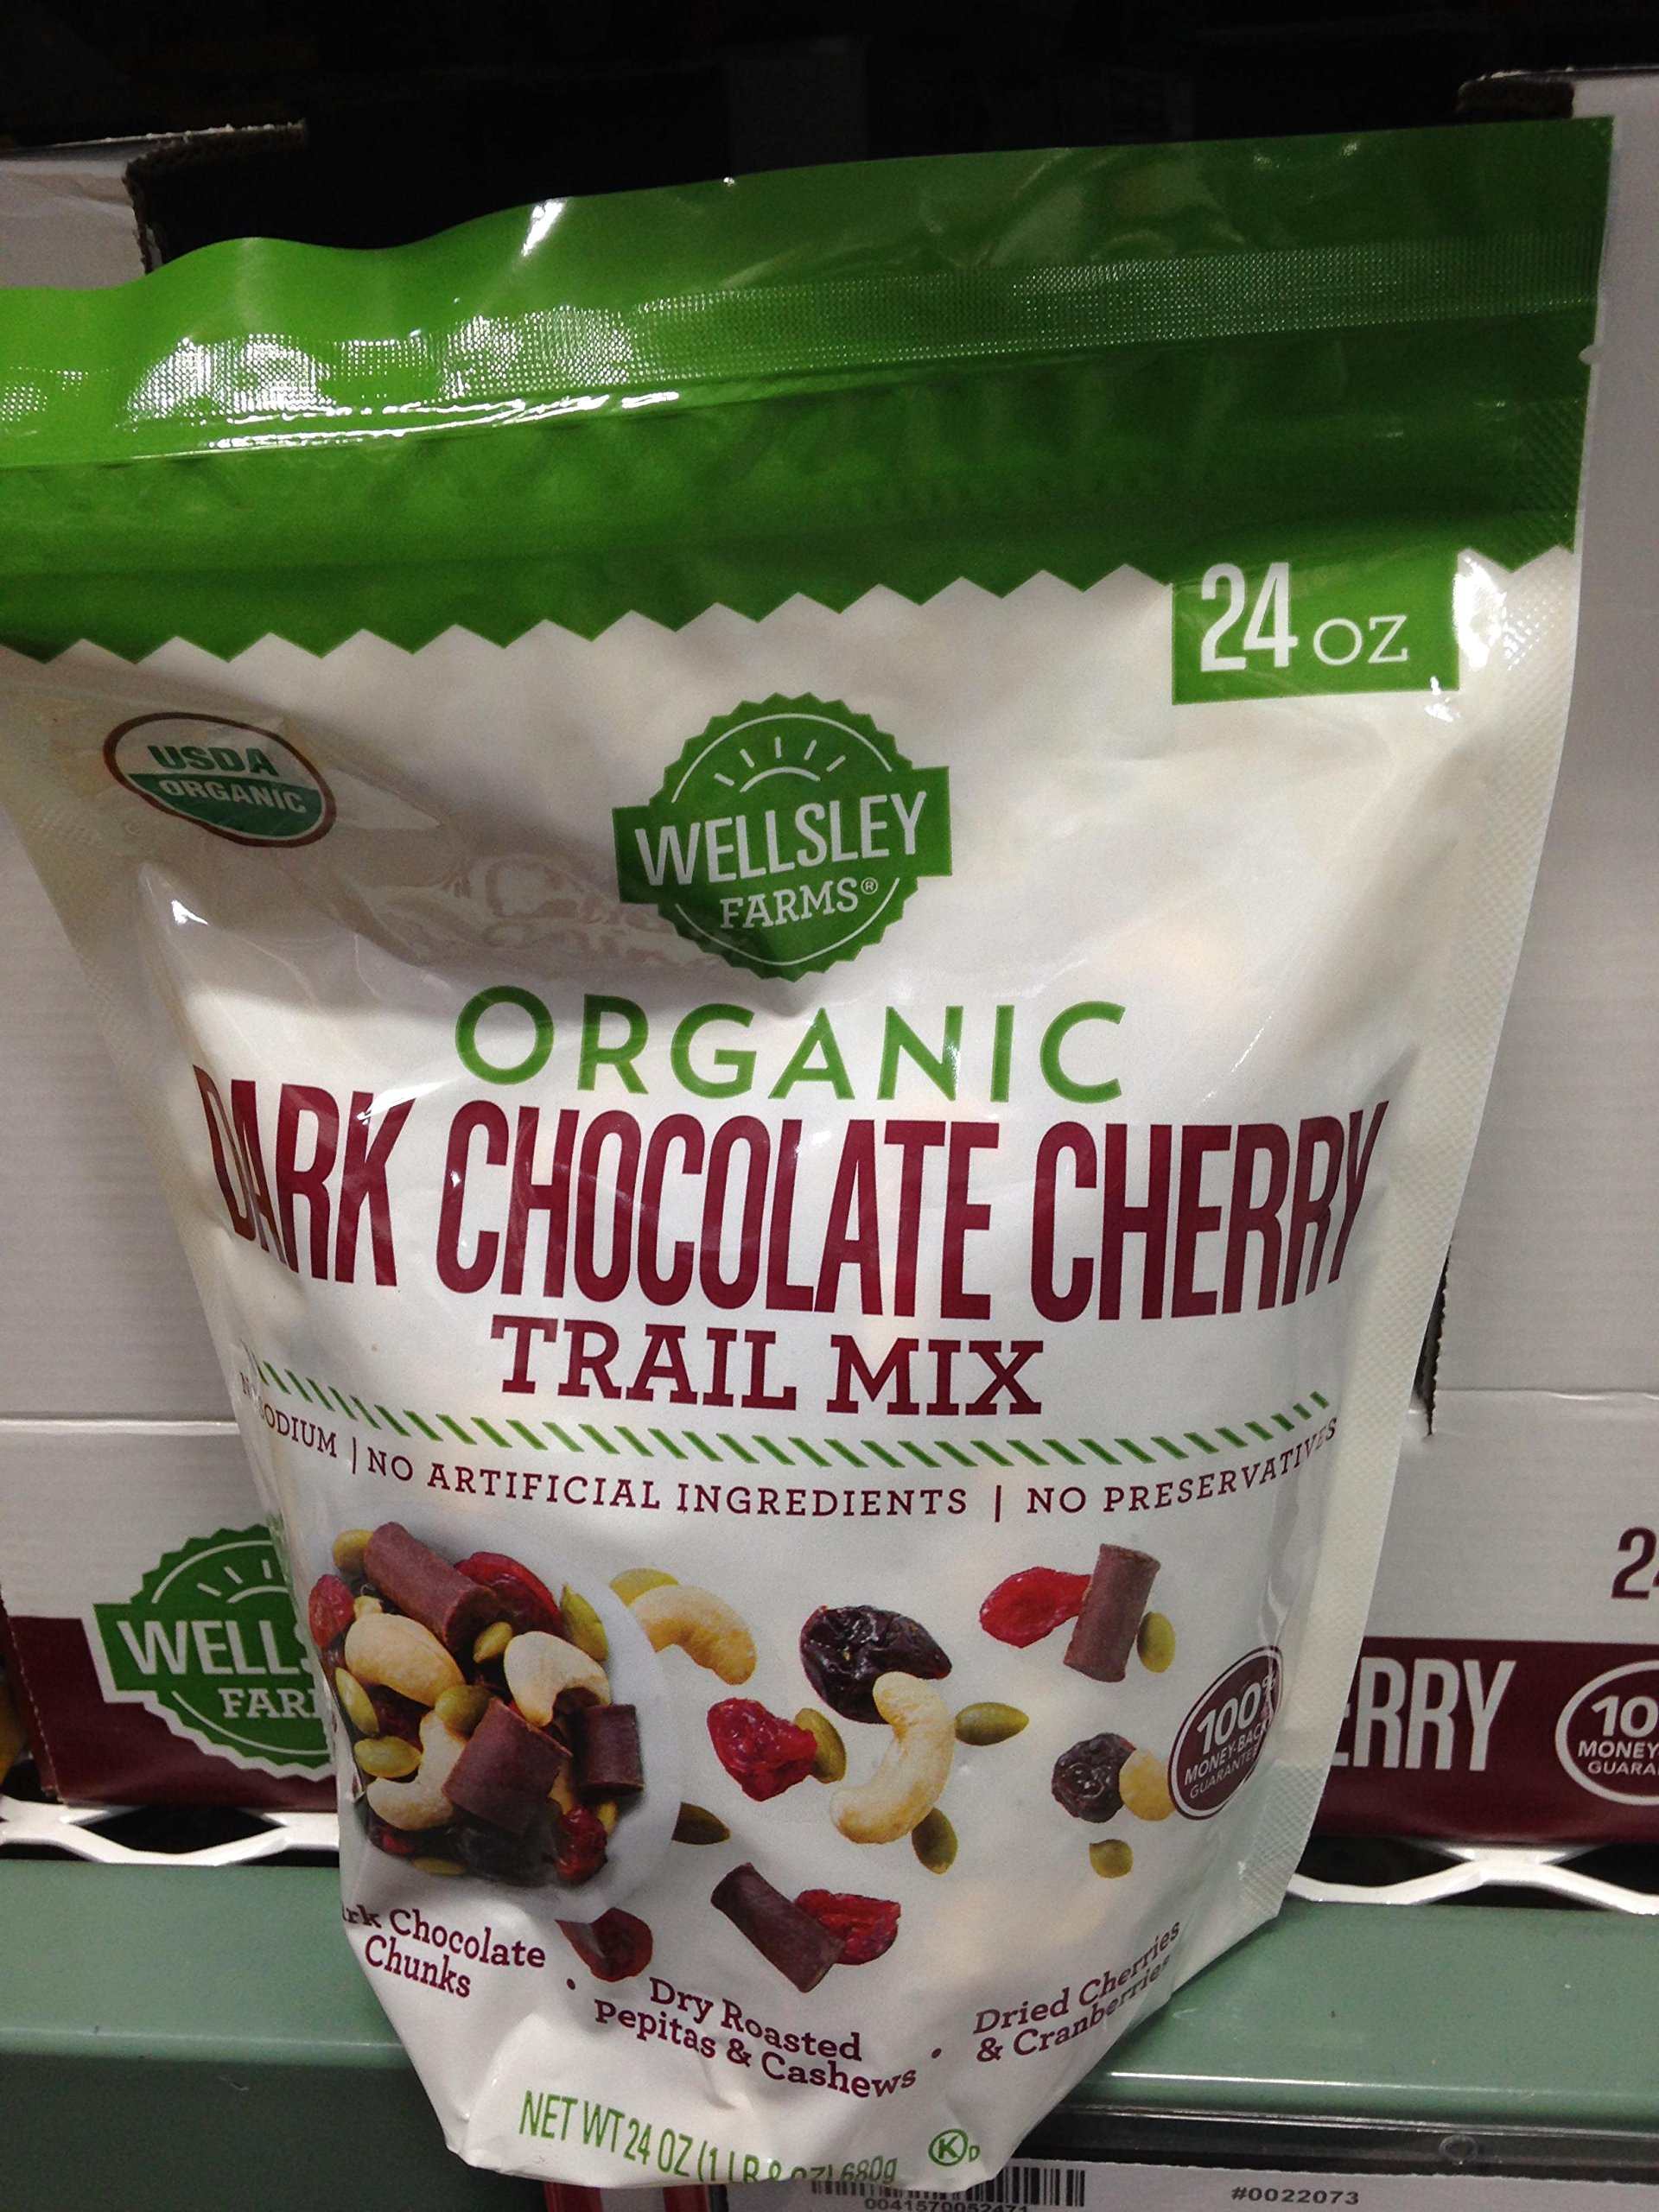 Wellsley Farms Organic Dark Chocolate Cherry Trail Mix, 24 oz. (pack of 2)